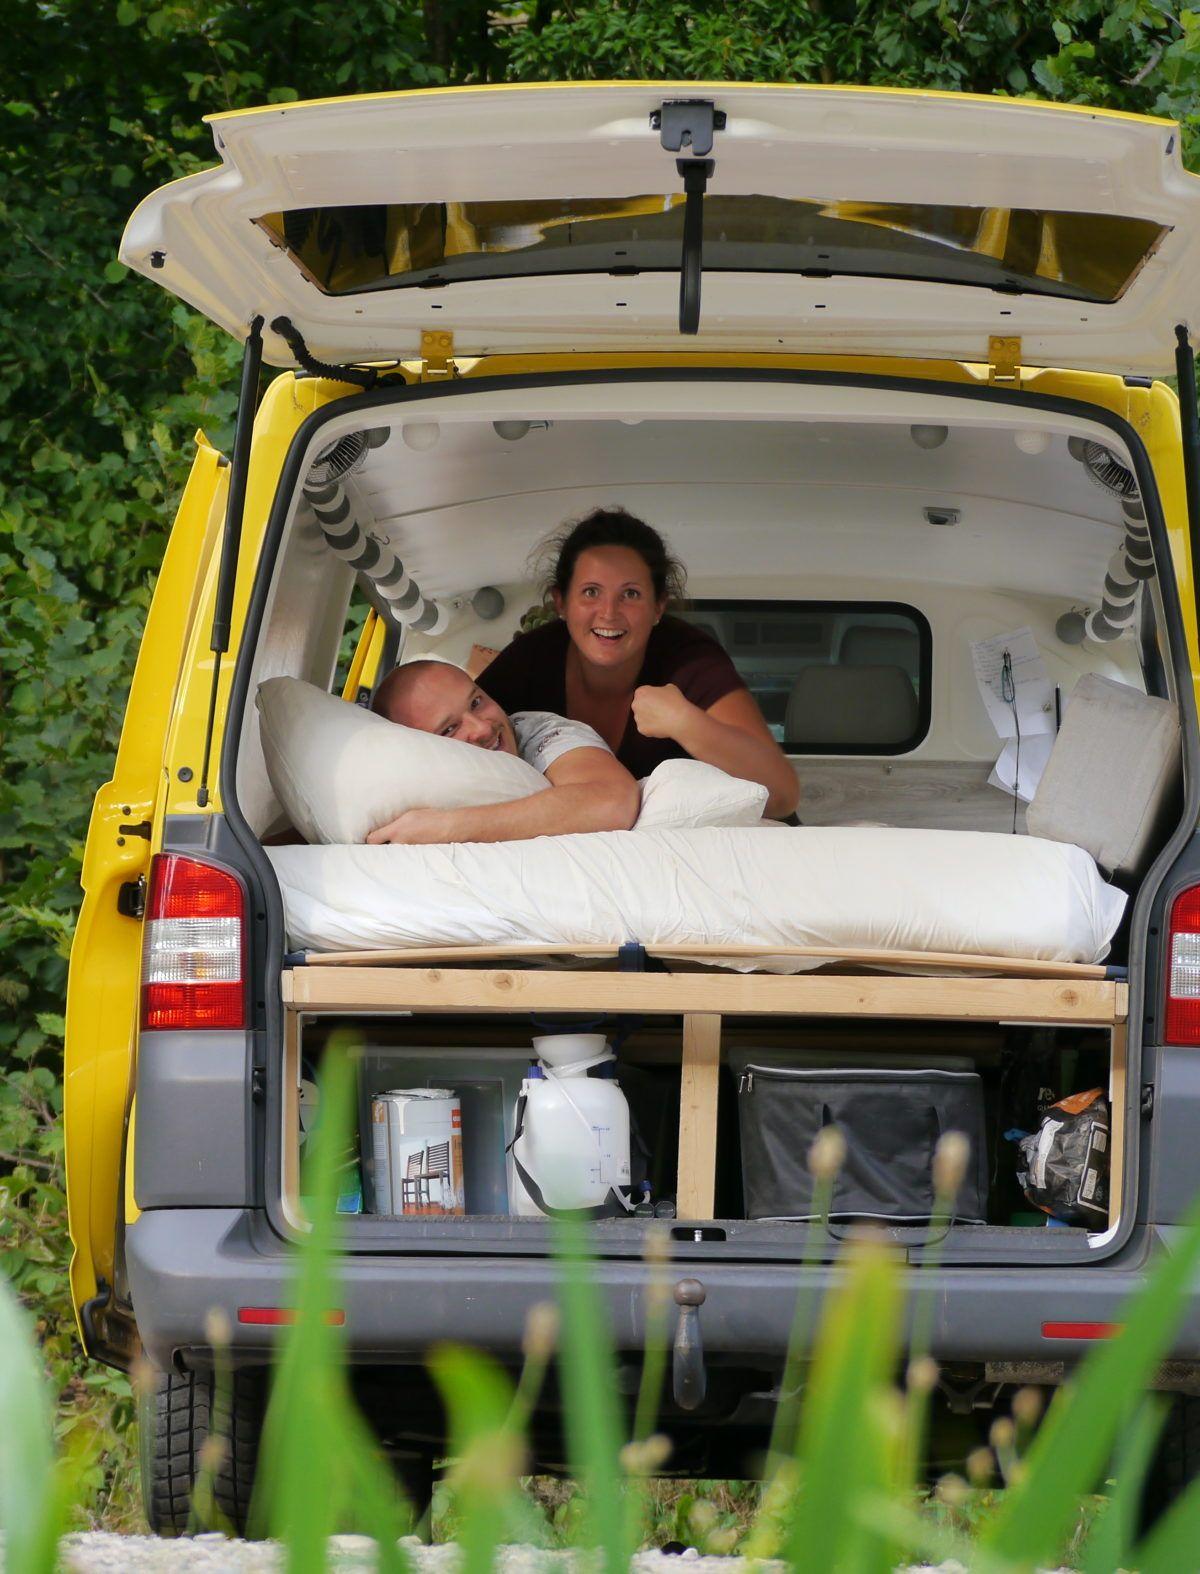 vw t5 camper ausbau einfaches bus bett bettrahmen bettgestell van id al. Black Bedroom Furniture Sets. Home Design Ideas